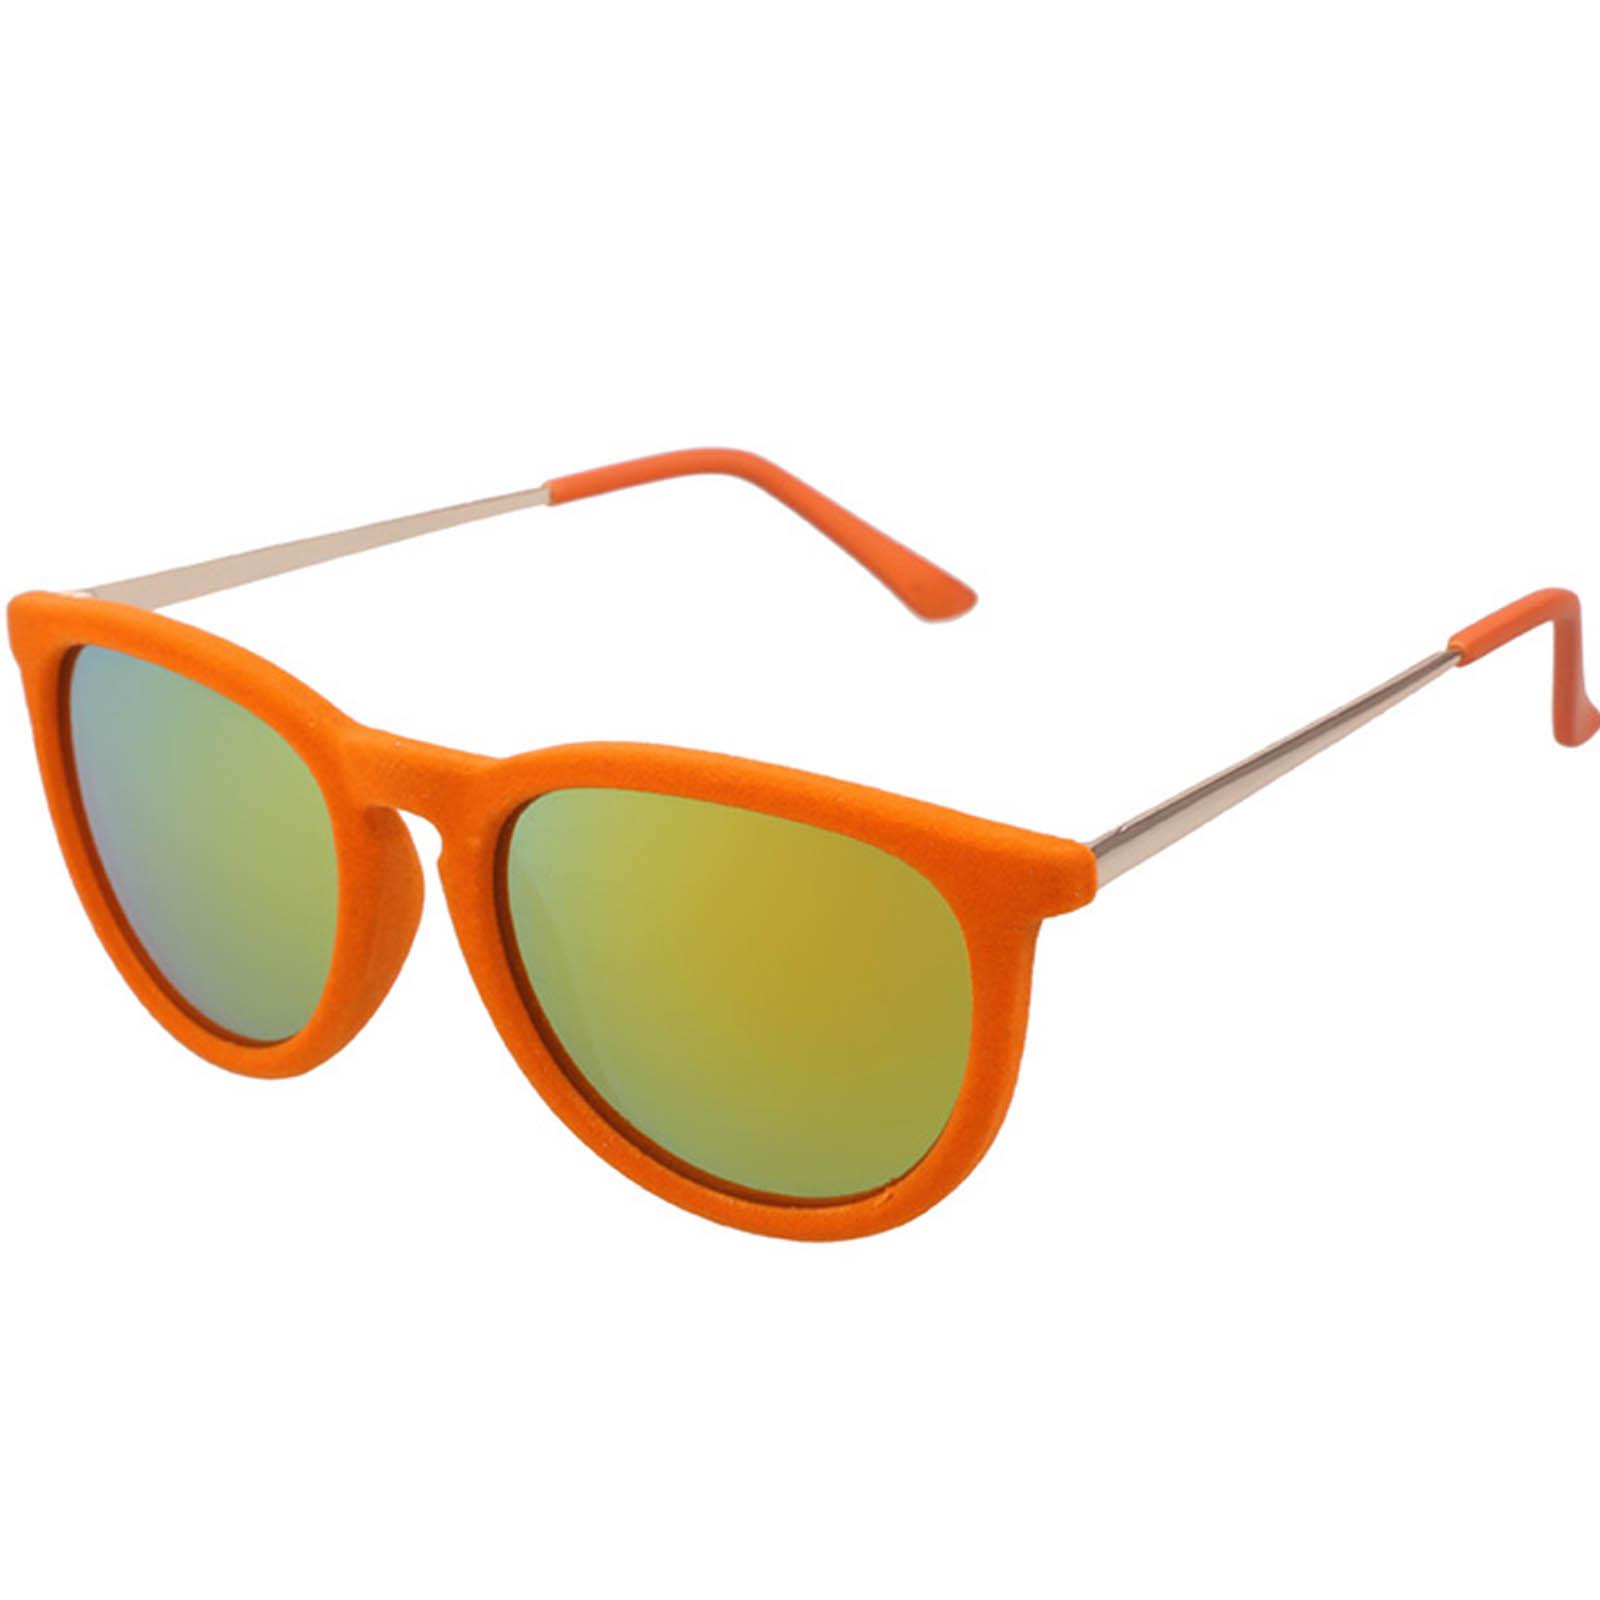 OWL ® 053 C5 Round Eyewear Sunglasses Women's Men's Plastic Round Circle Velvet Orange Frame Orange Mirror Lens One Pair